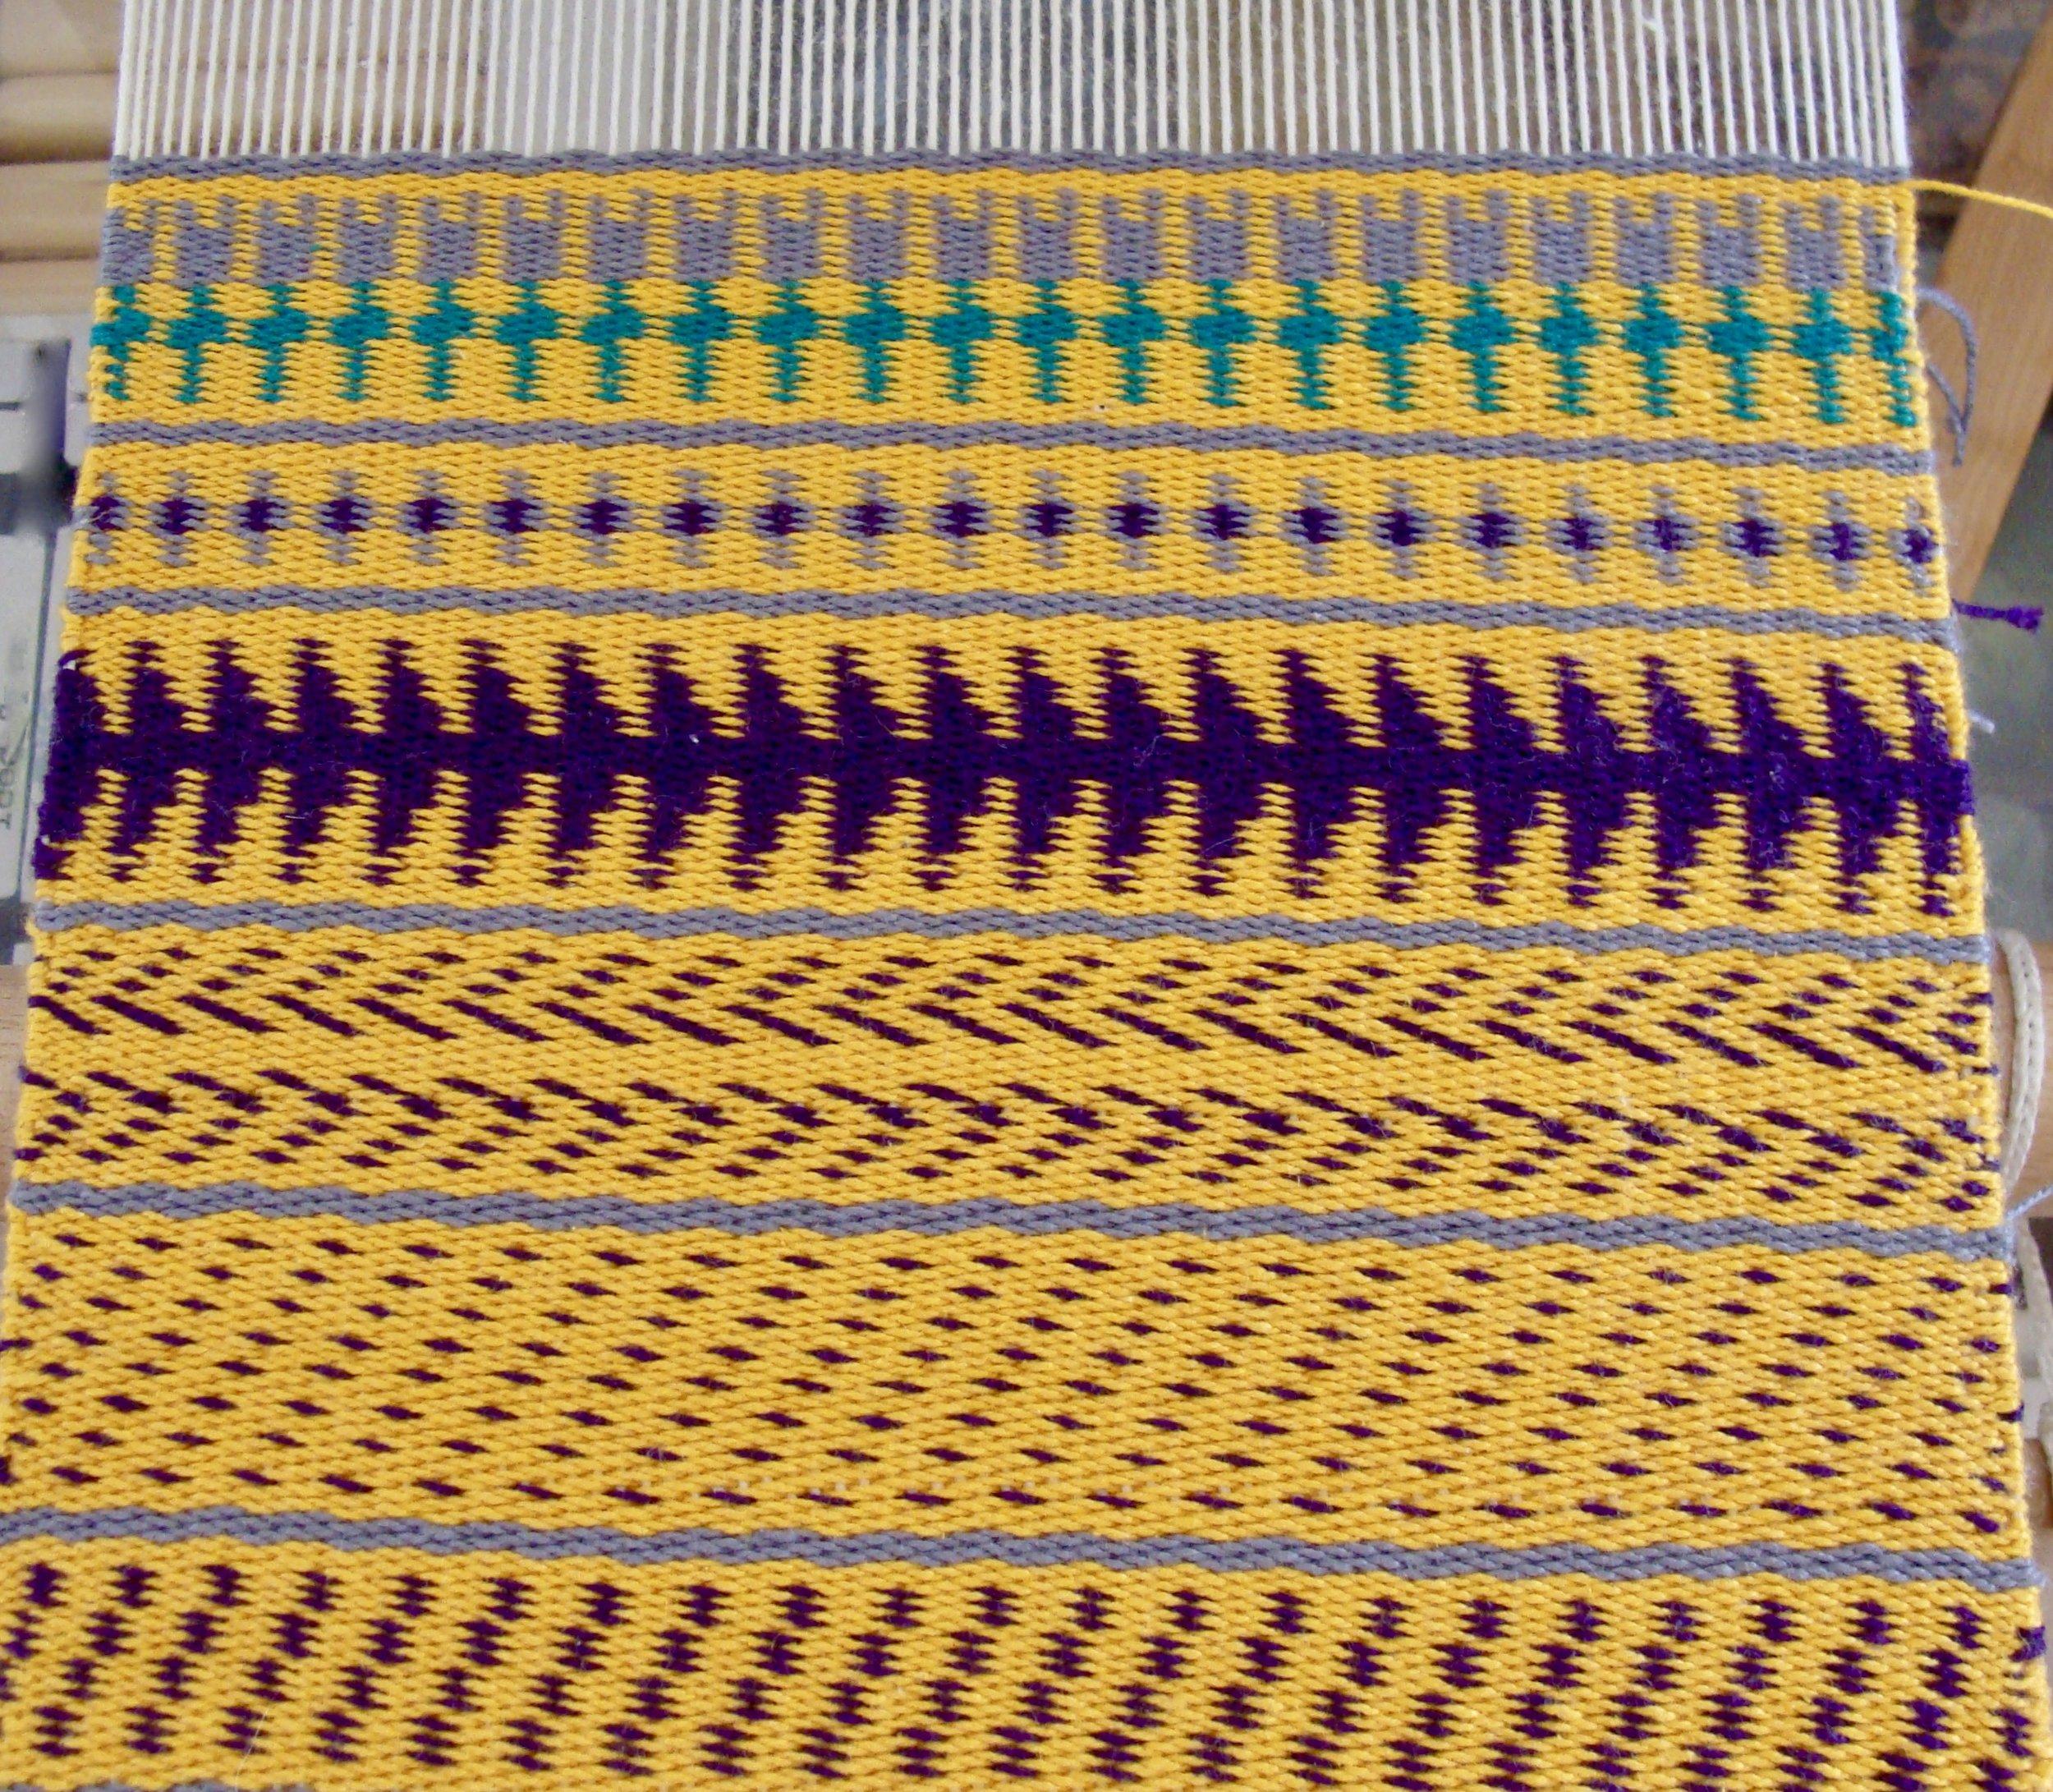 Sampler III Twill 2/2 weft faced on loom